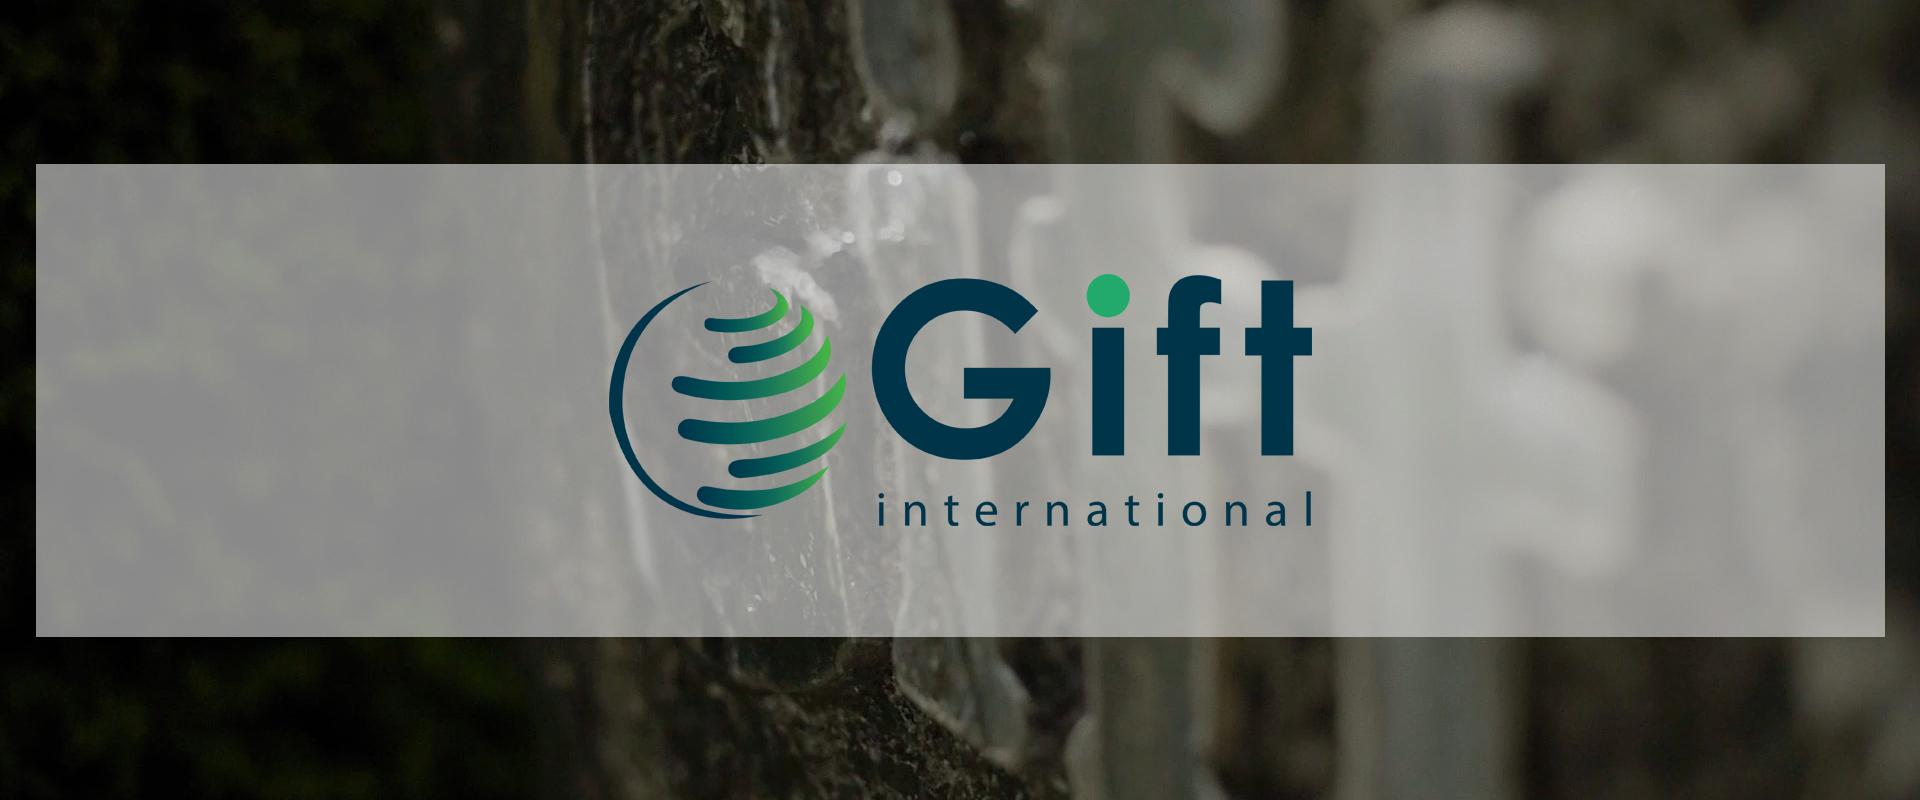 gift-intl-promo-brand-video